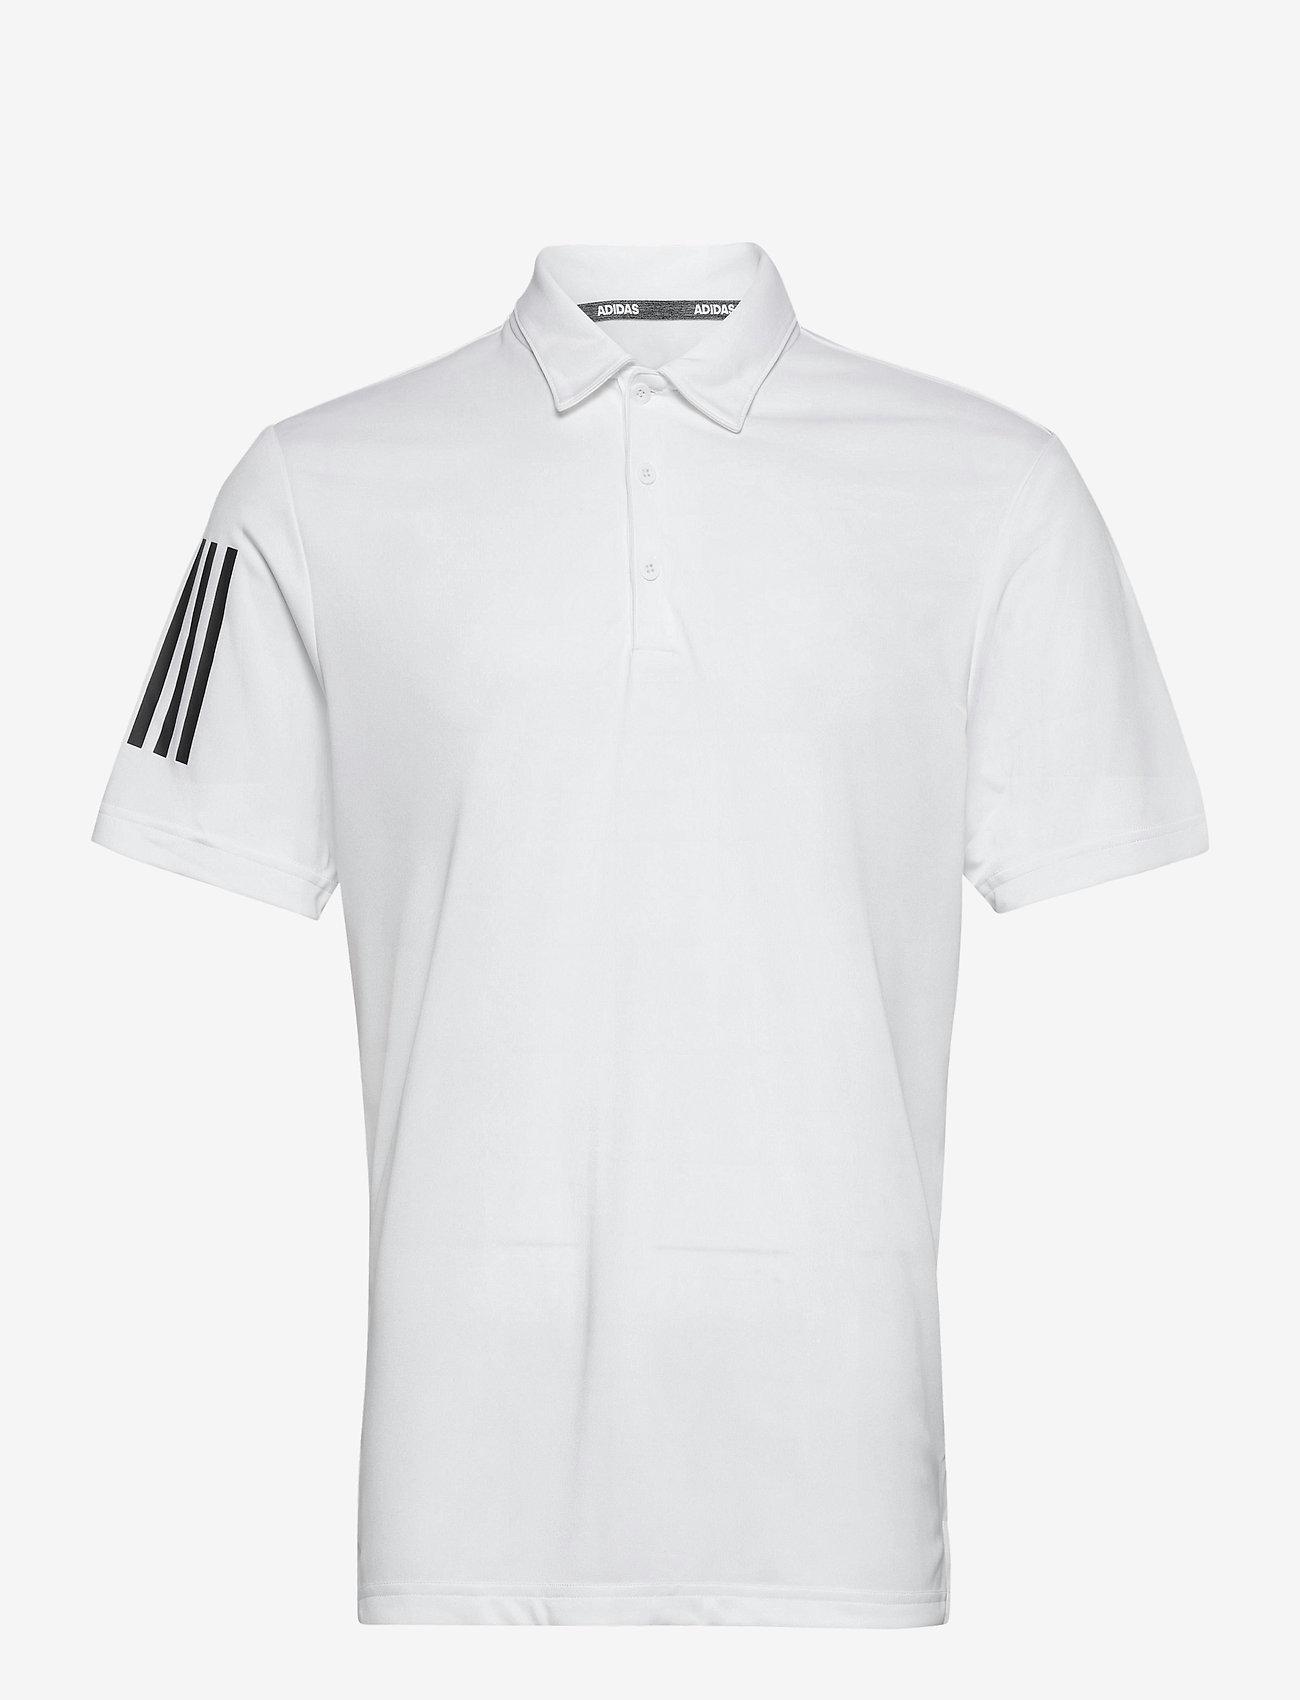 adidas Golf - 3-Stripe Basic - kurzärmelig - white/black - 0